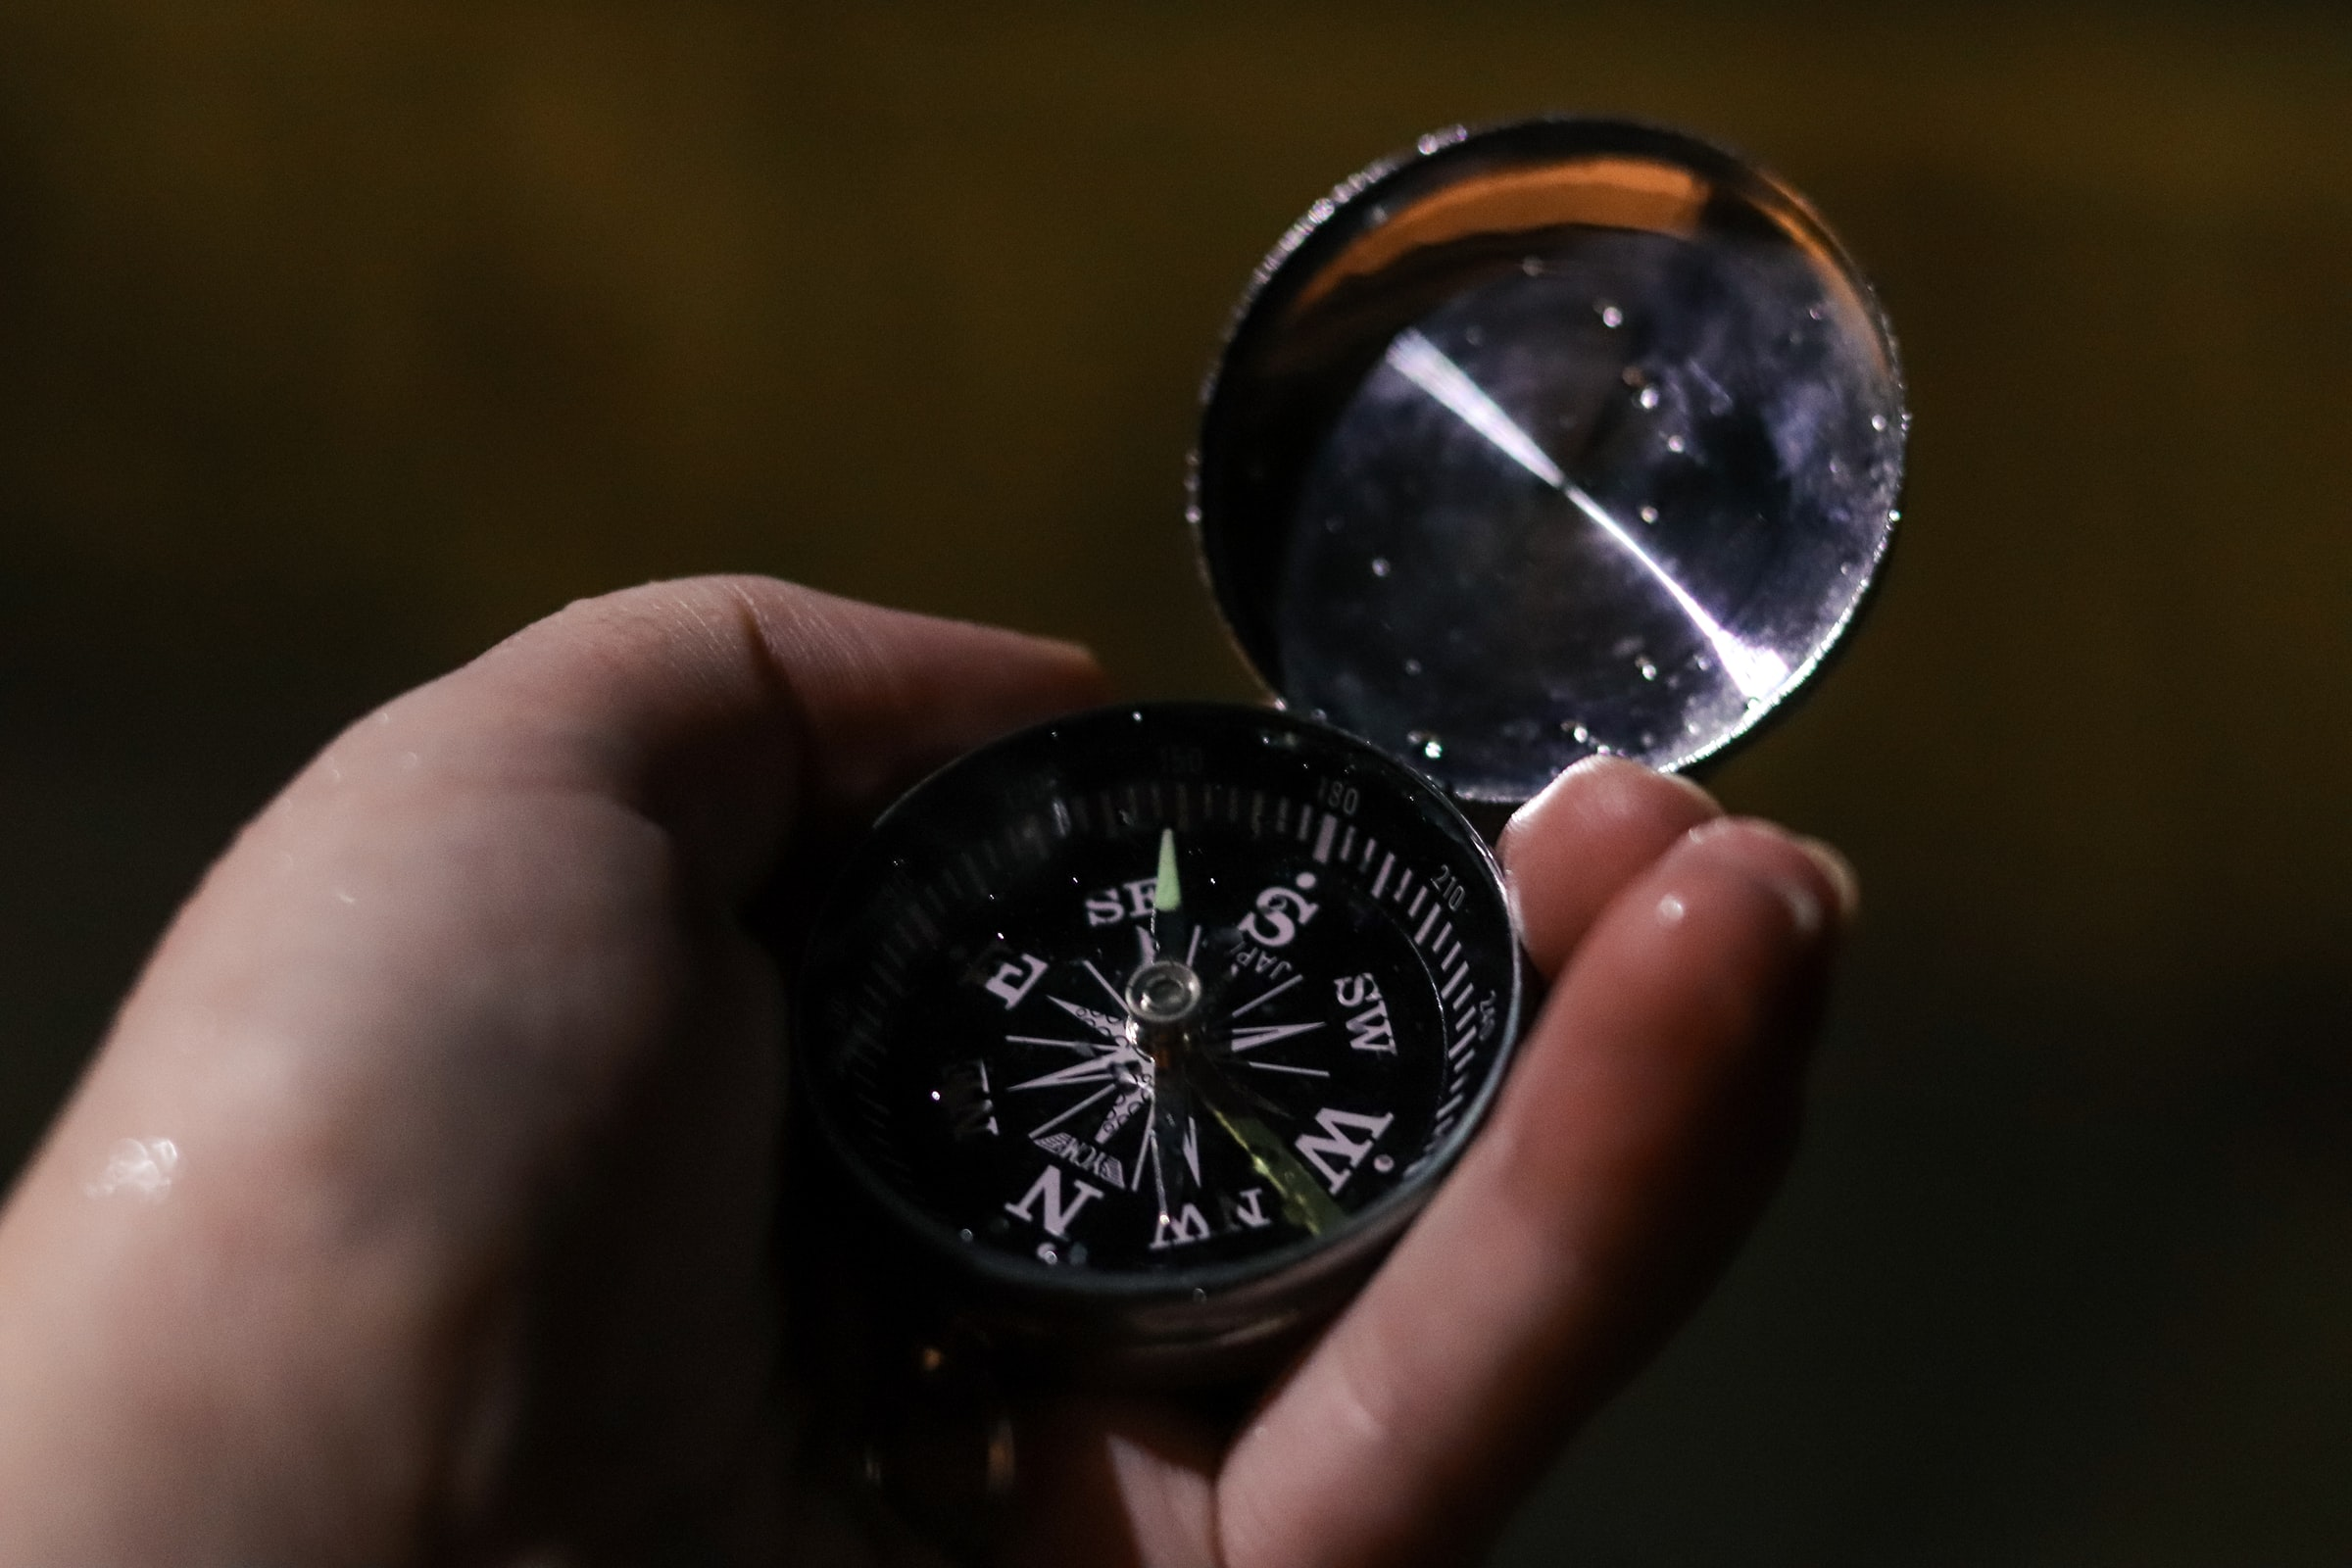 Closeup of hand holding compass.